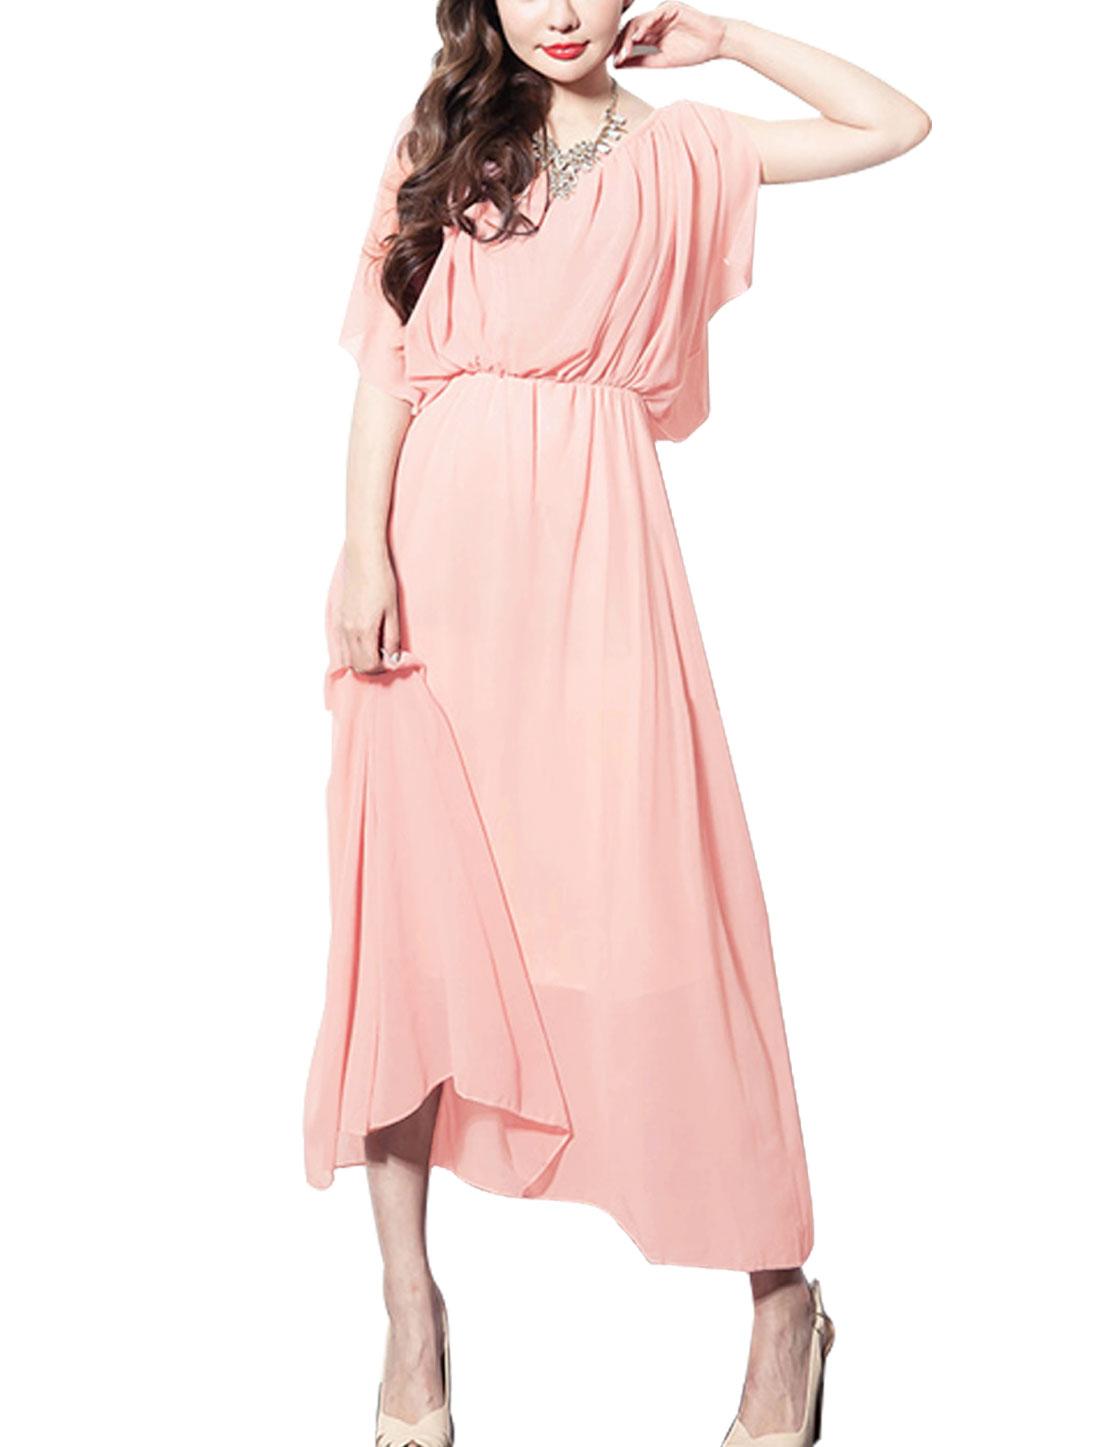 Ladies Elastic Waist Sleeveless Gathered Detail Maxi Chiffon Dress Pink S